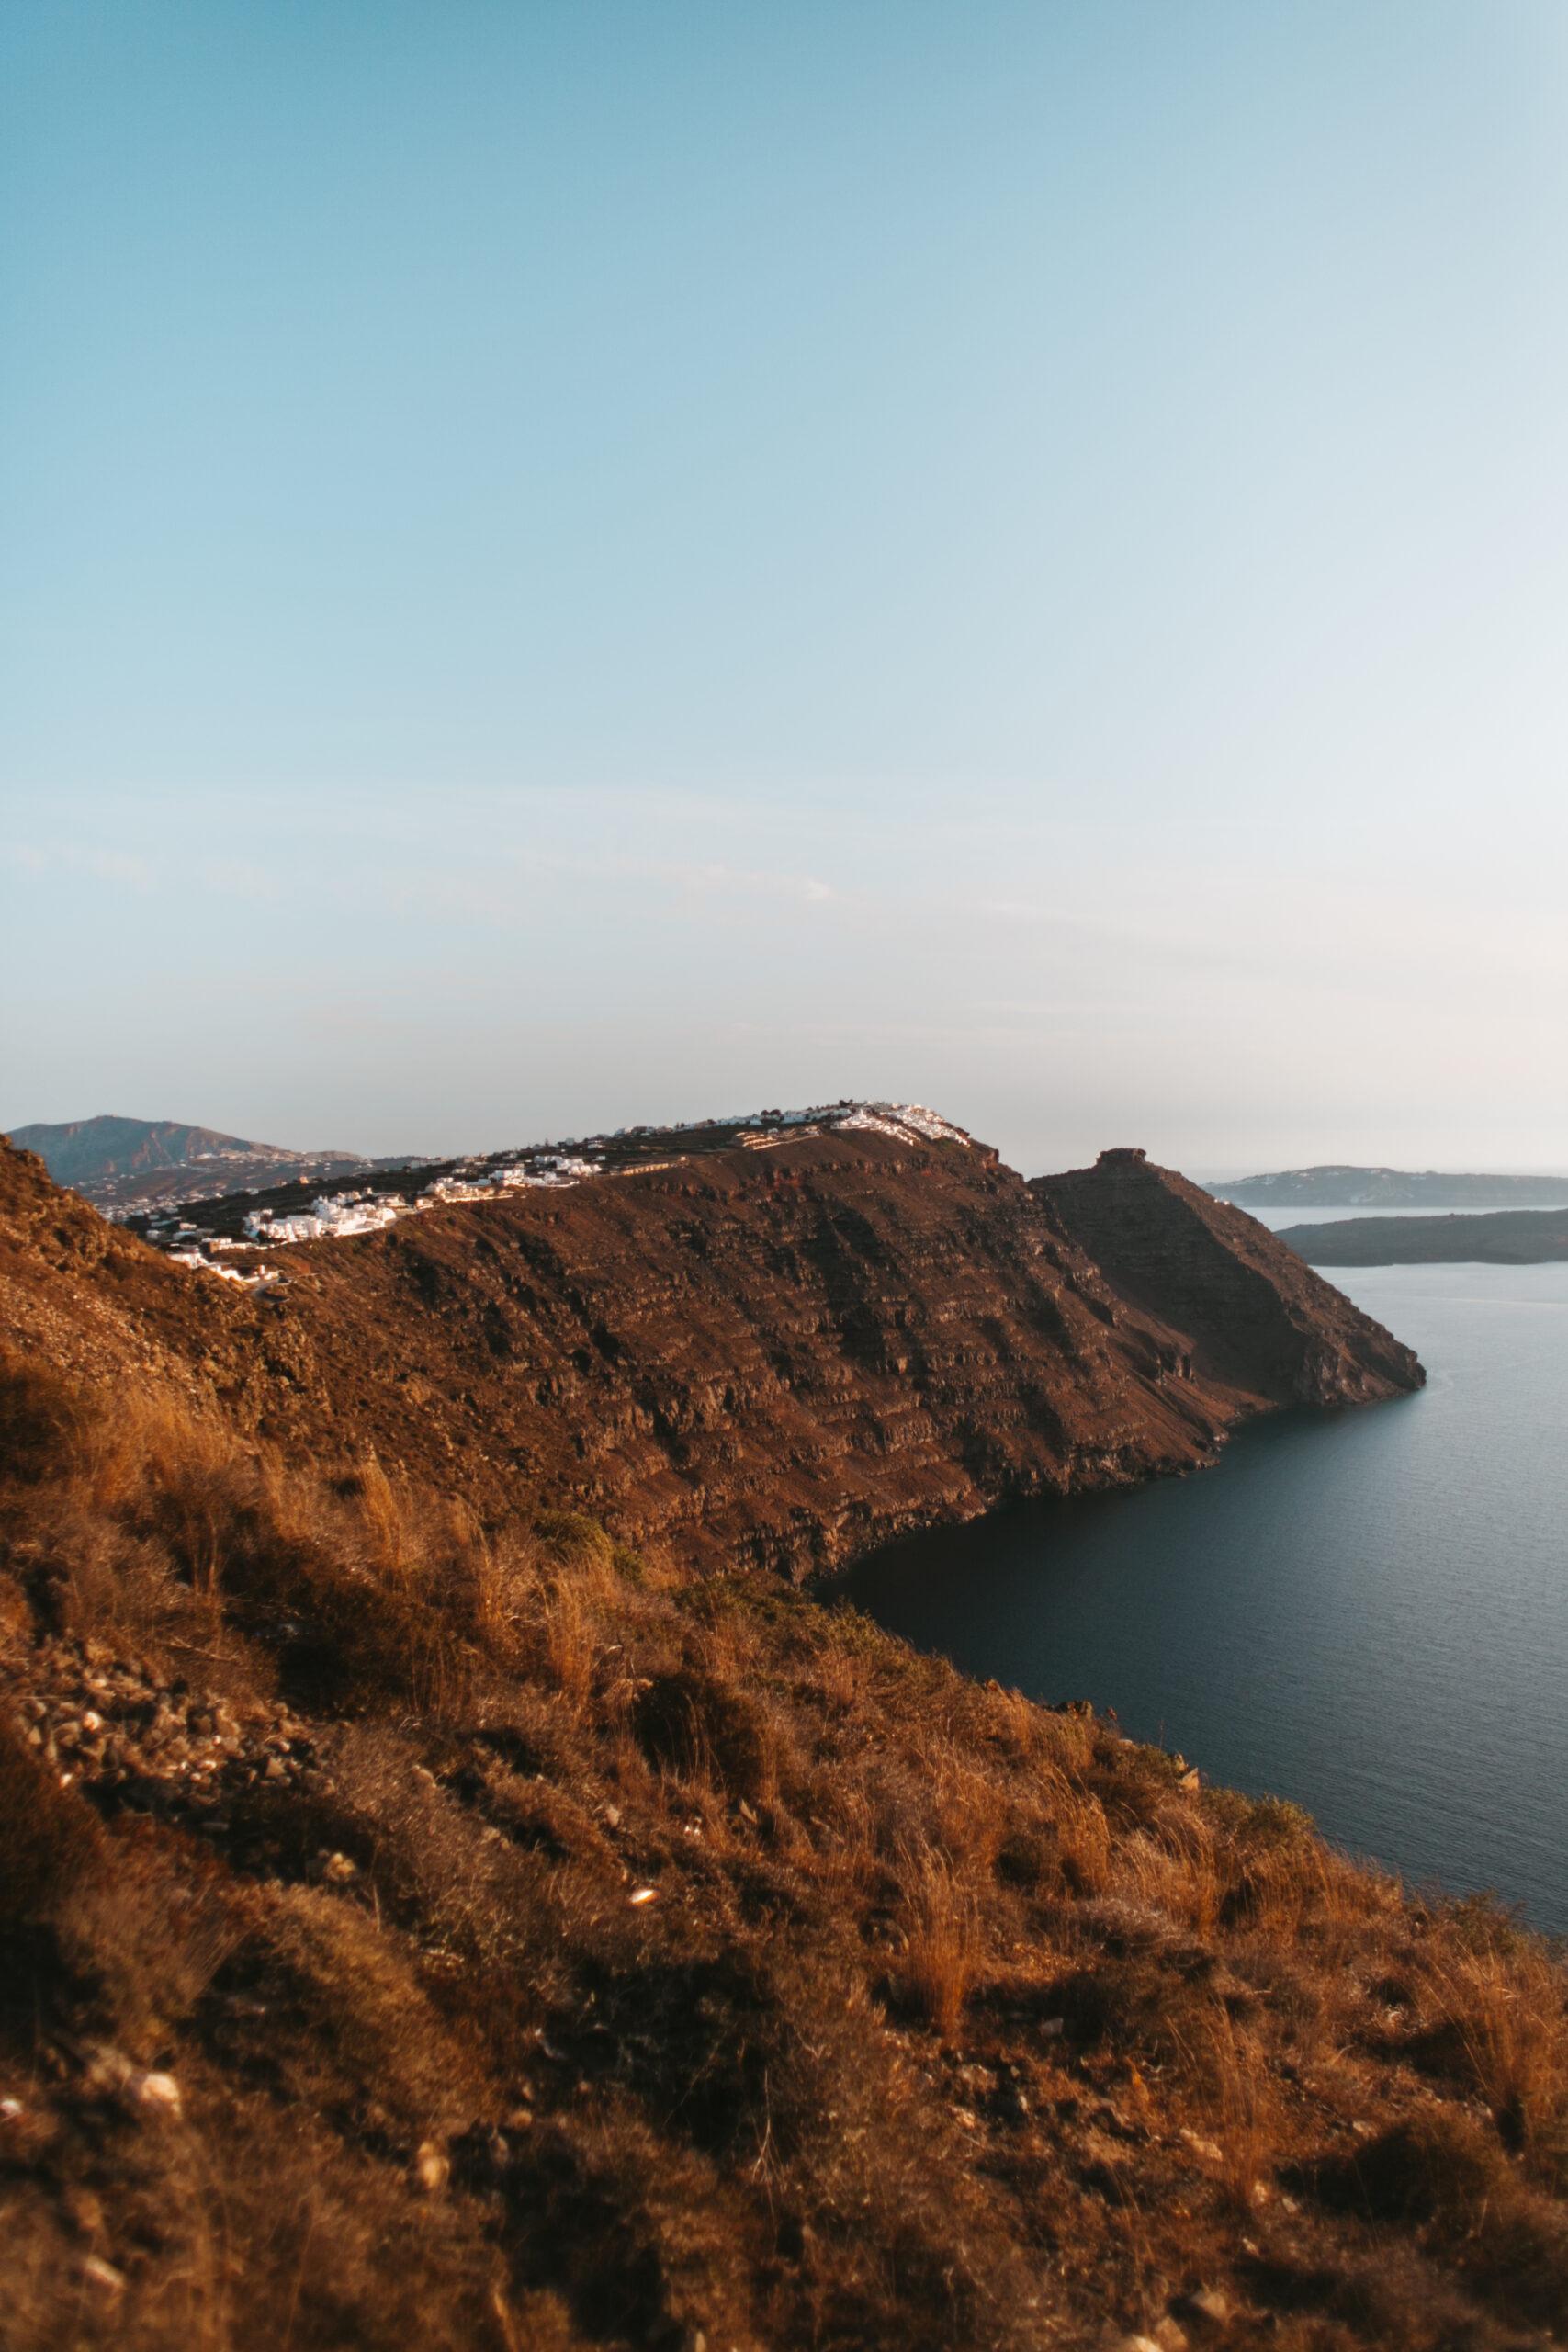 Widok na kalderę i Imerovigli, droga z Firy do Oii, trekking Santorini